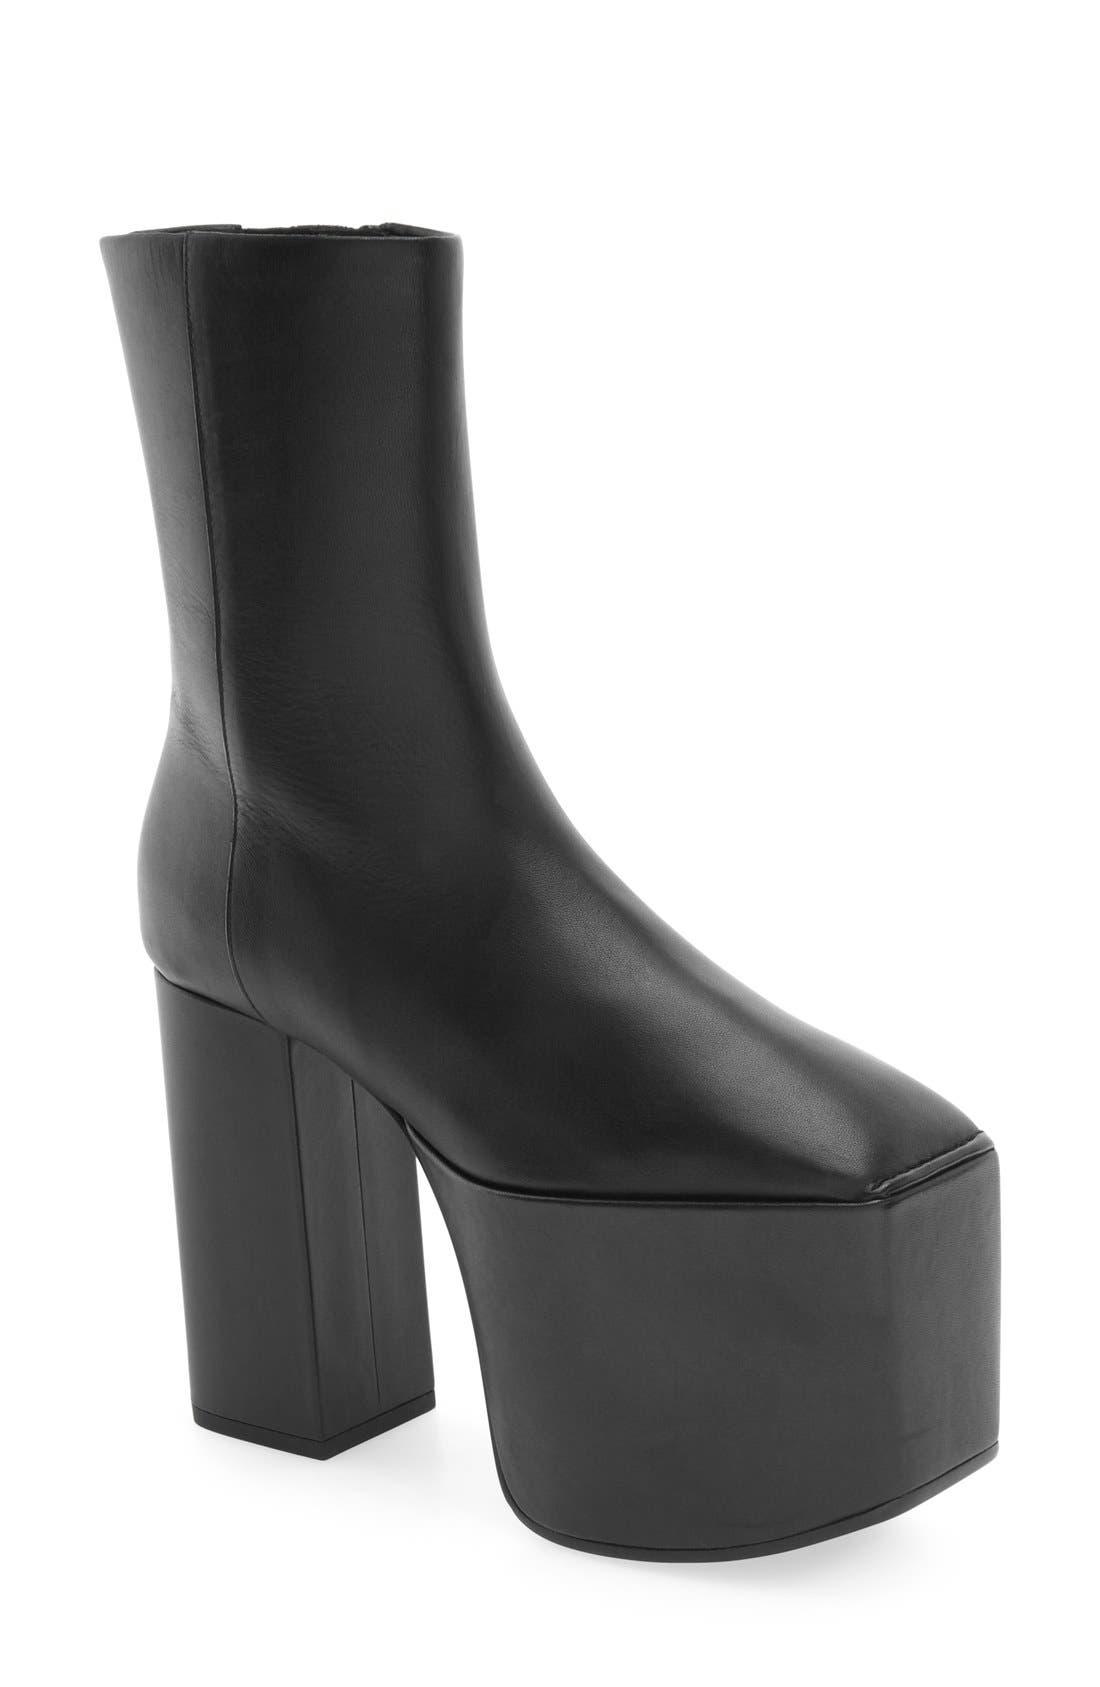 Alternate Image 1 Selected - Balenciaga Platform Bootie (Women)